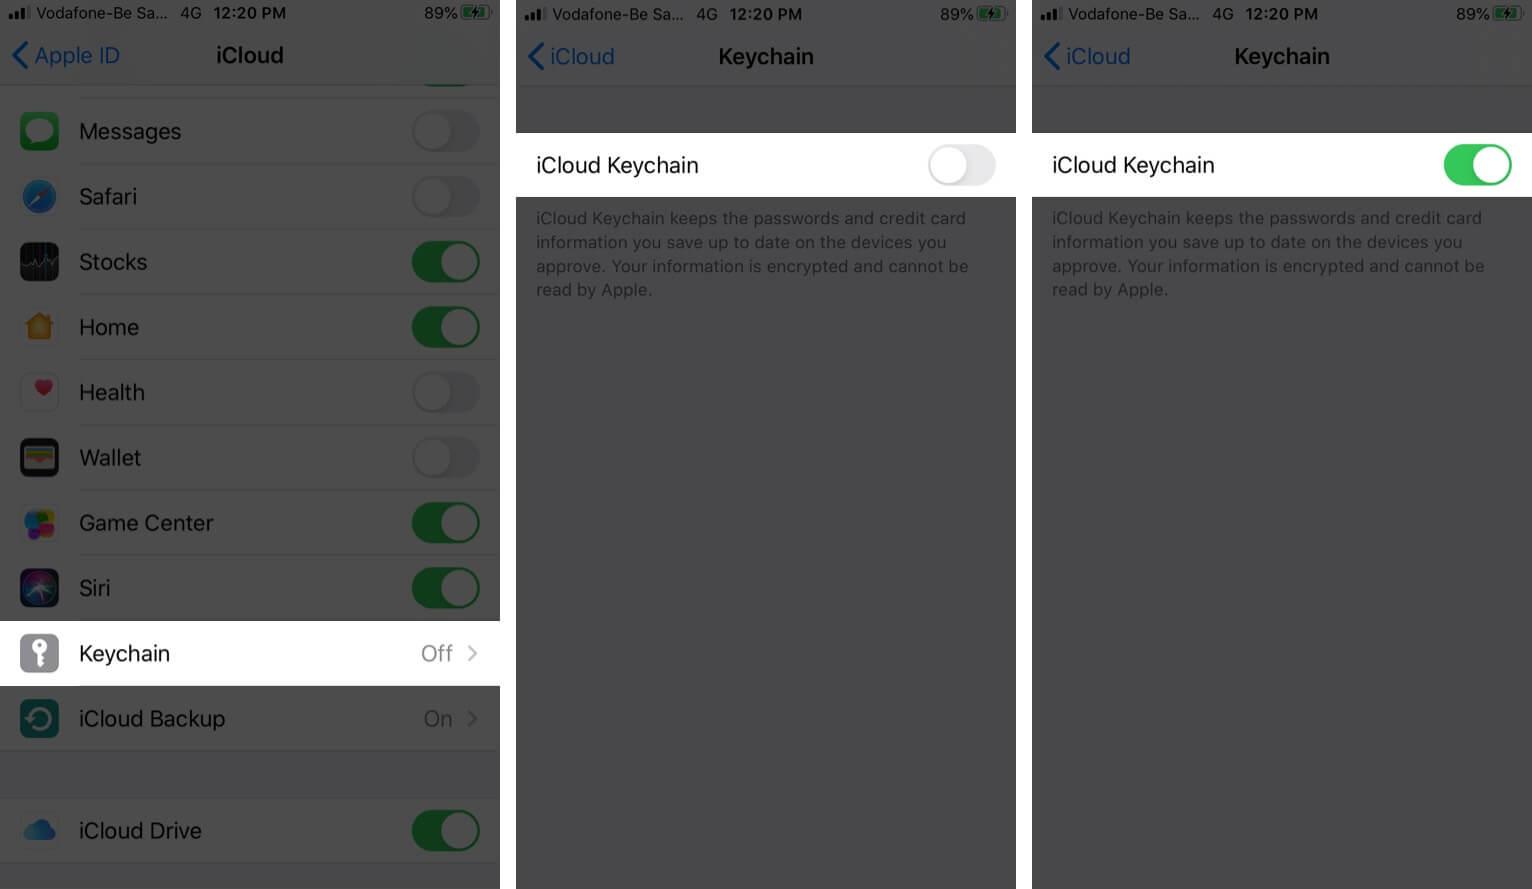 Turn ON iCloud Keychain in iOS 13 on iPhone